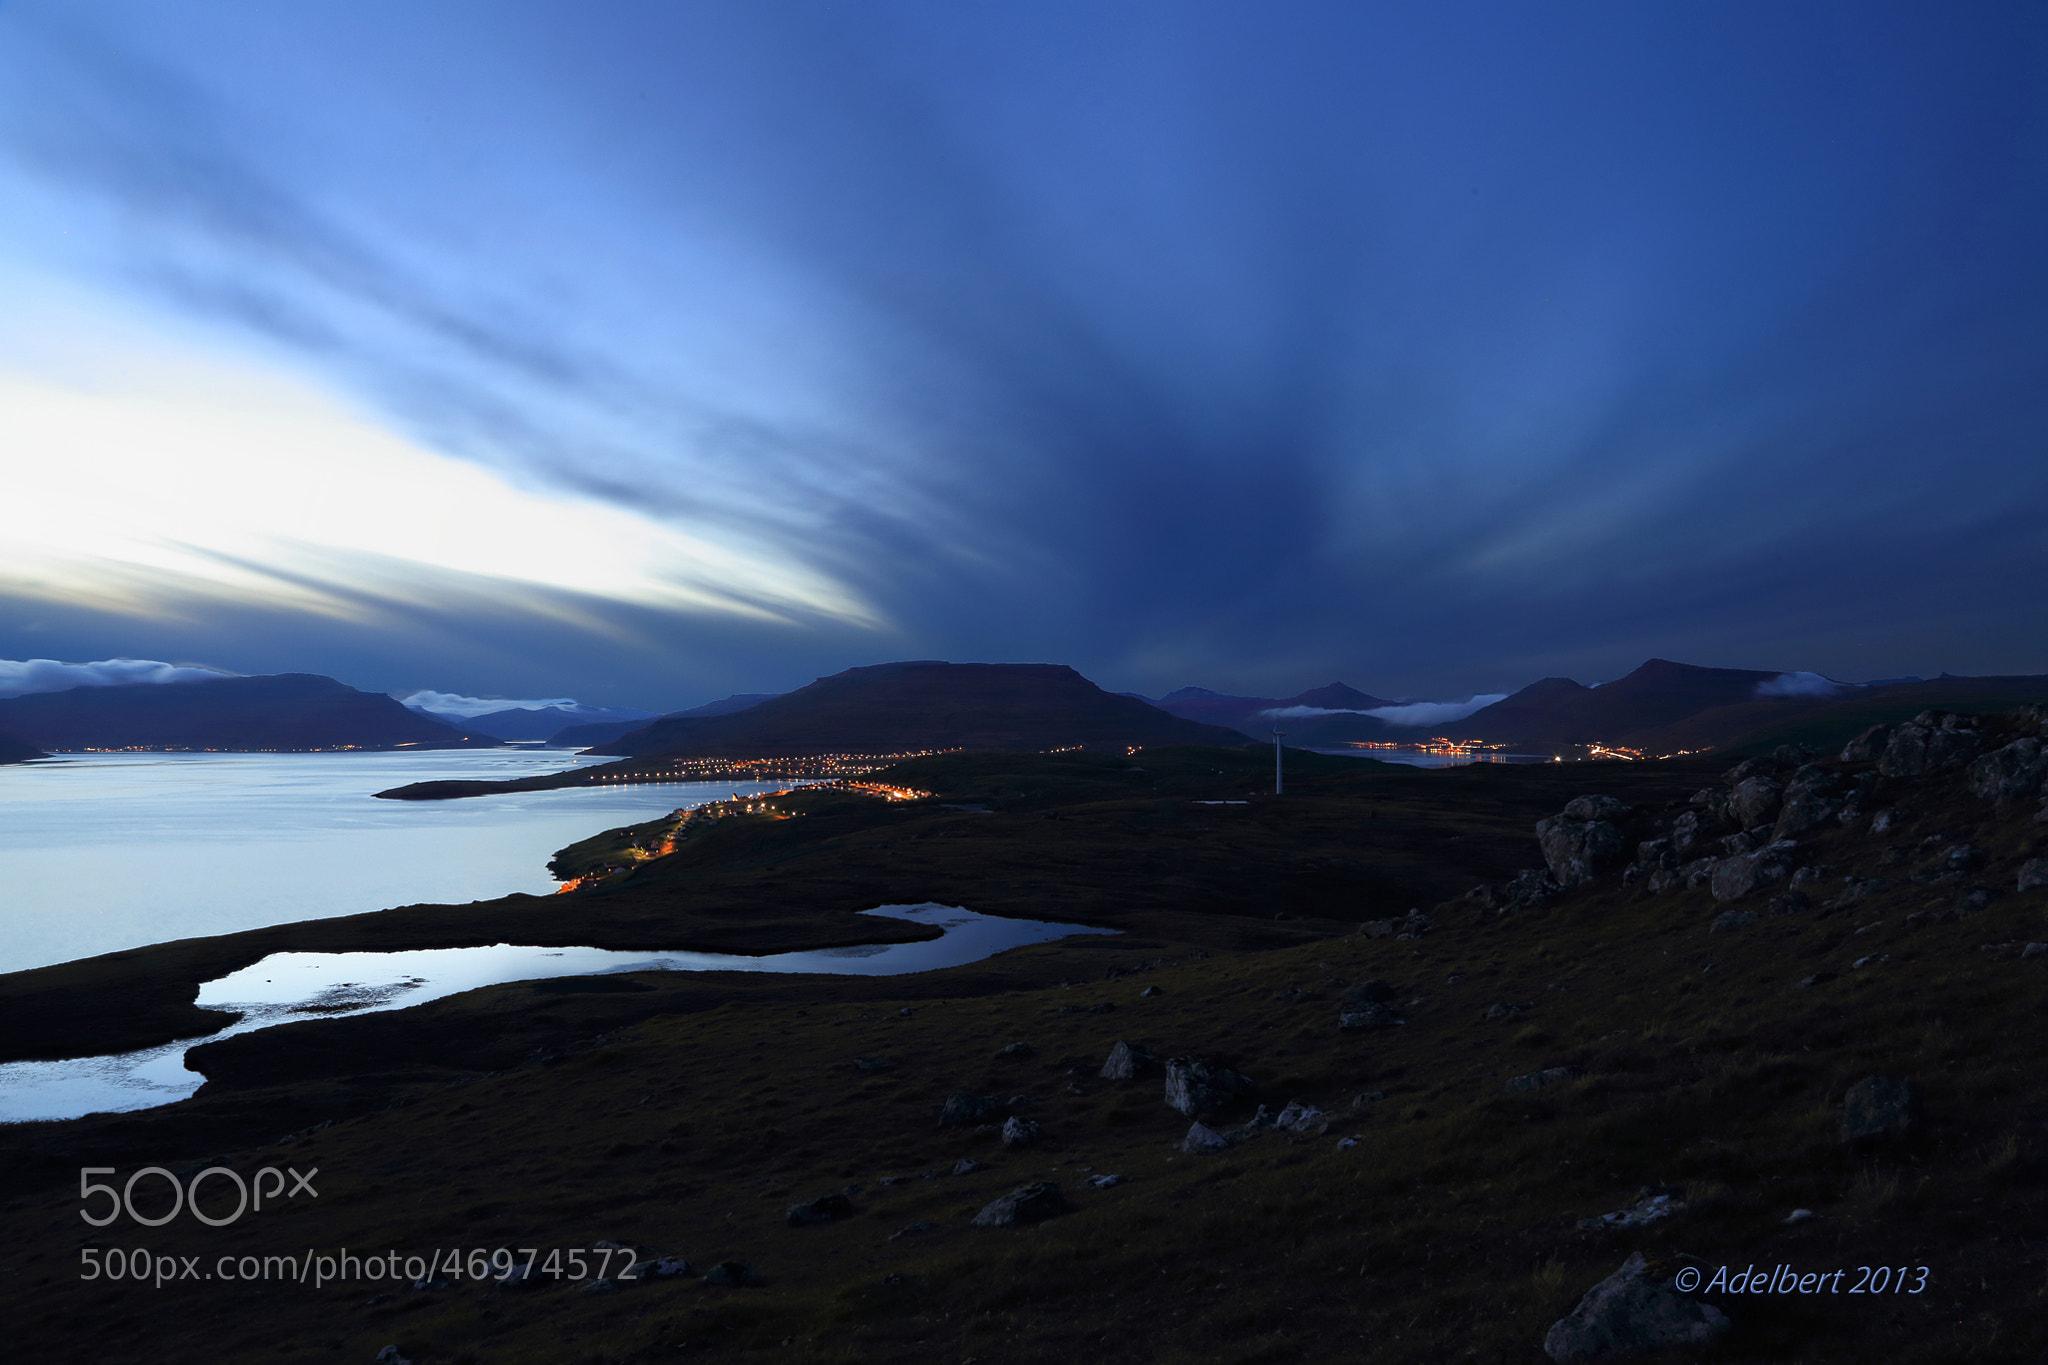 Photograph Autumn Evening by Adelbert Ellingsgaard on 500px